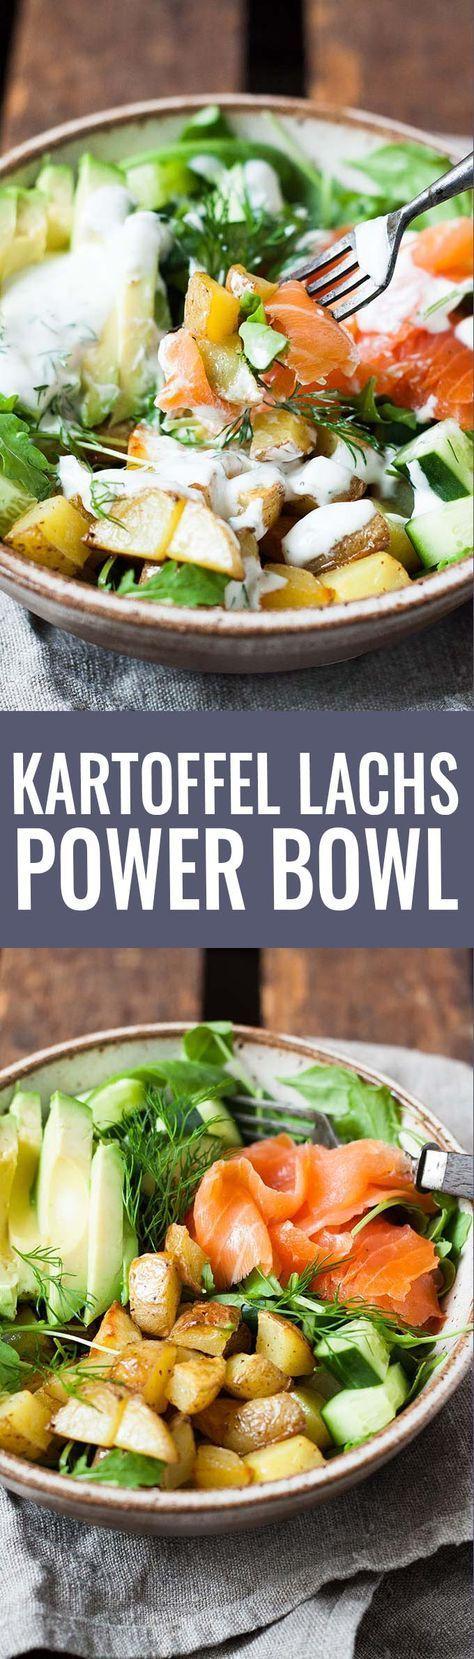 Kartoffel Lachs Power Bowl mit Avocado